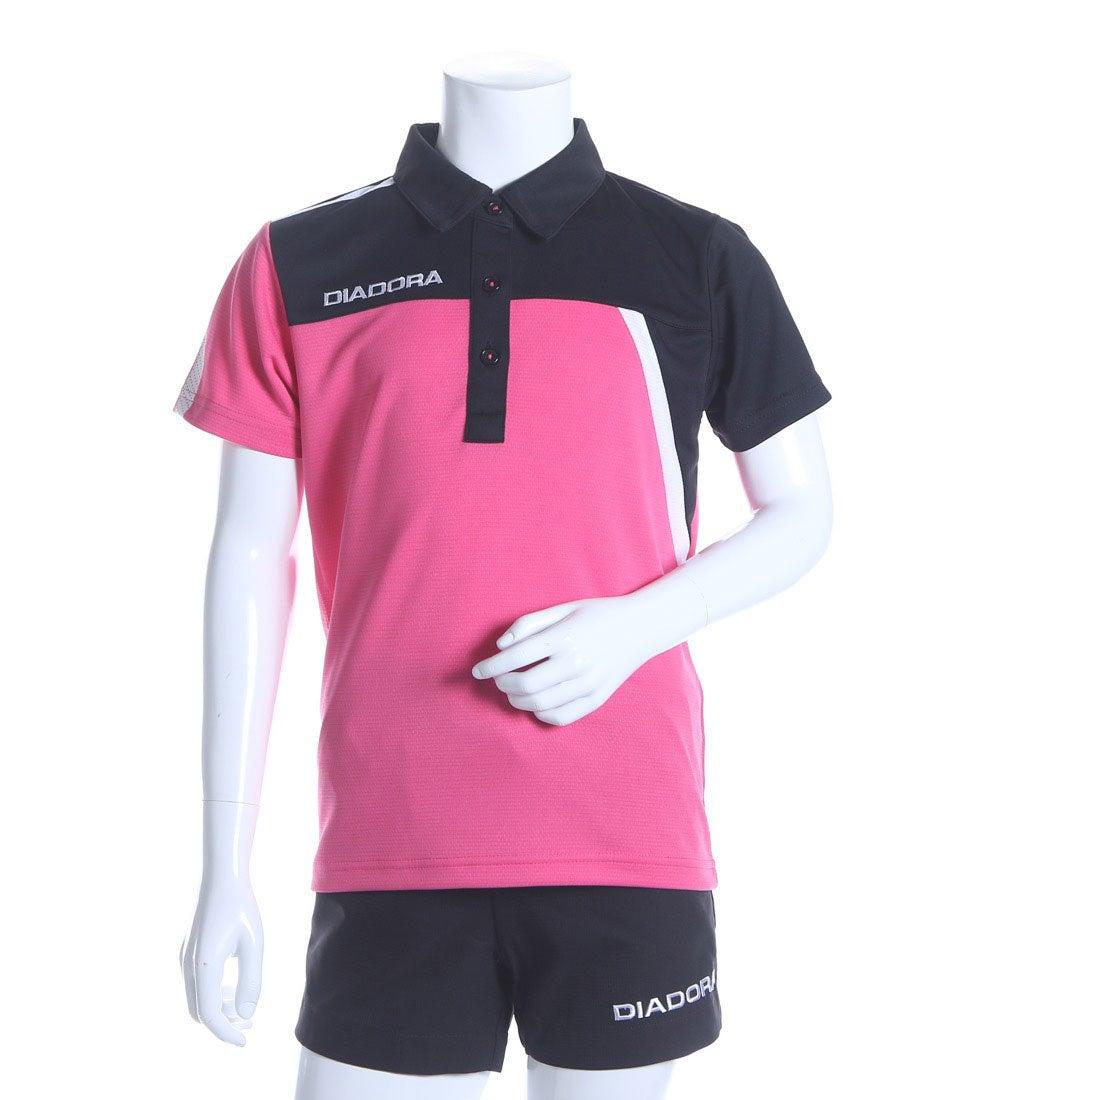 dd0e58f520d78 ディアドラ Diadora ジュニアテニスシャツ ジュニア ゲームシャツ(女の子) TJ6340 ピンク (ピンクFL×ホワイト)  -レディースファッション通販 ロコンドガールズ ...